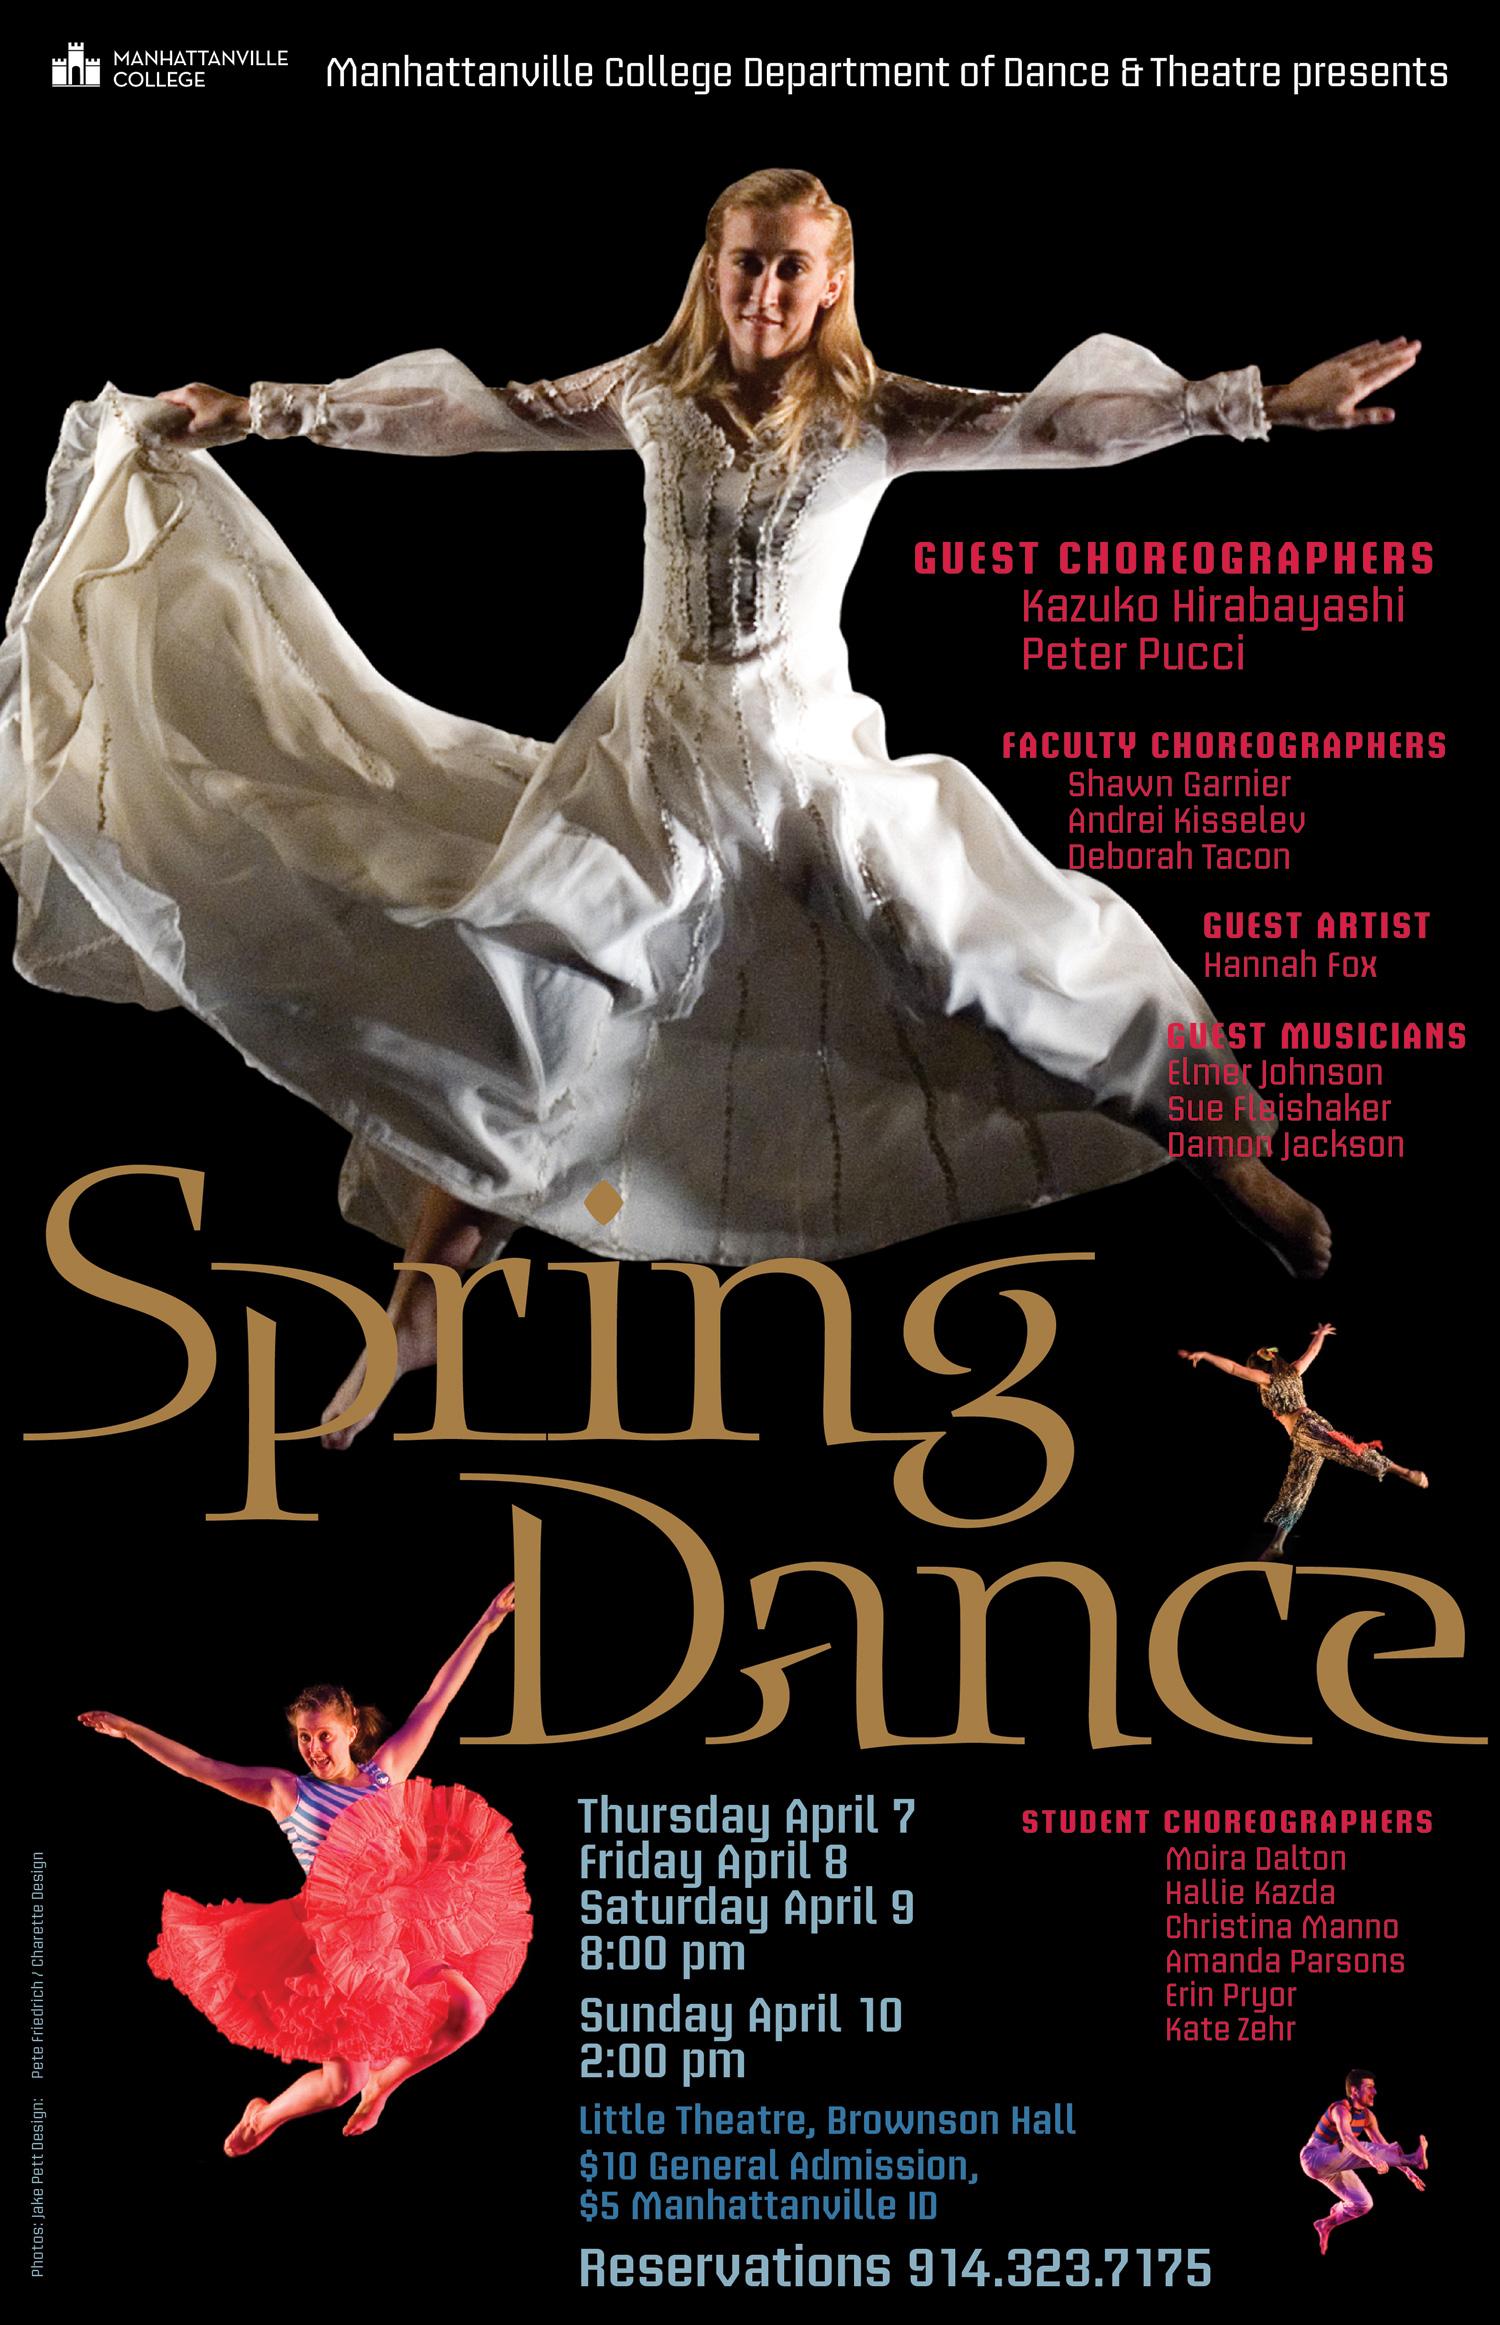 MVille_Dance_Poster_2011.jpg